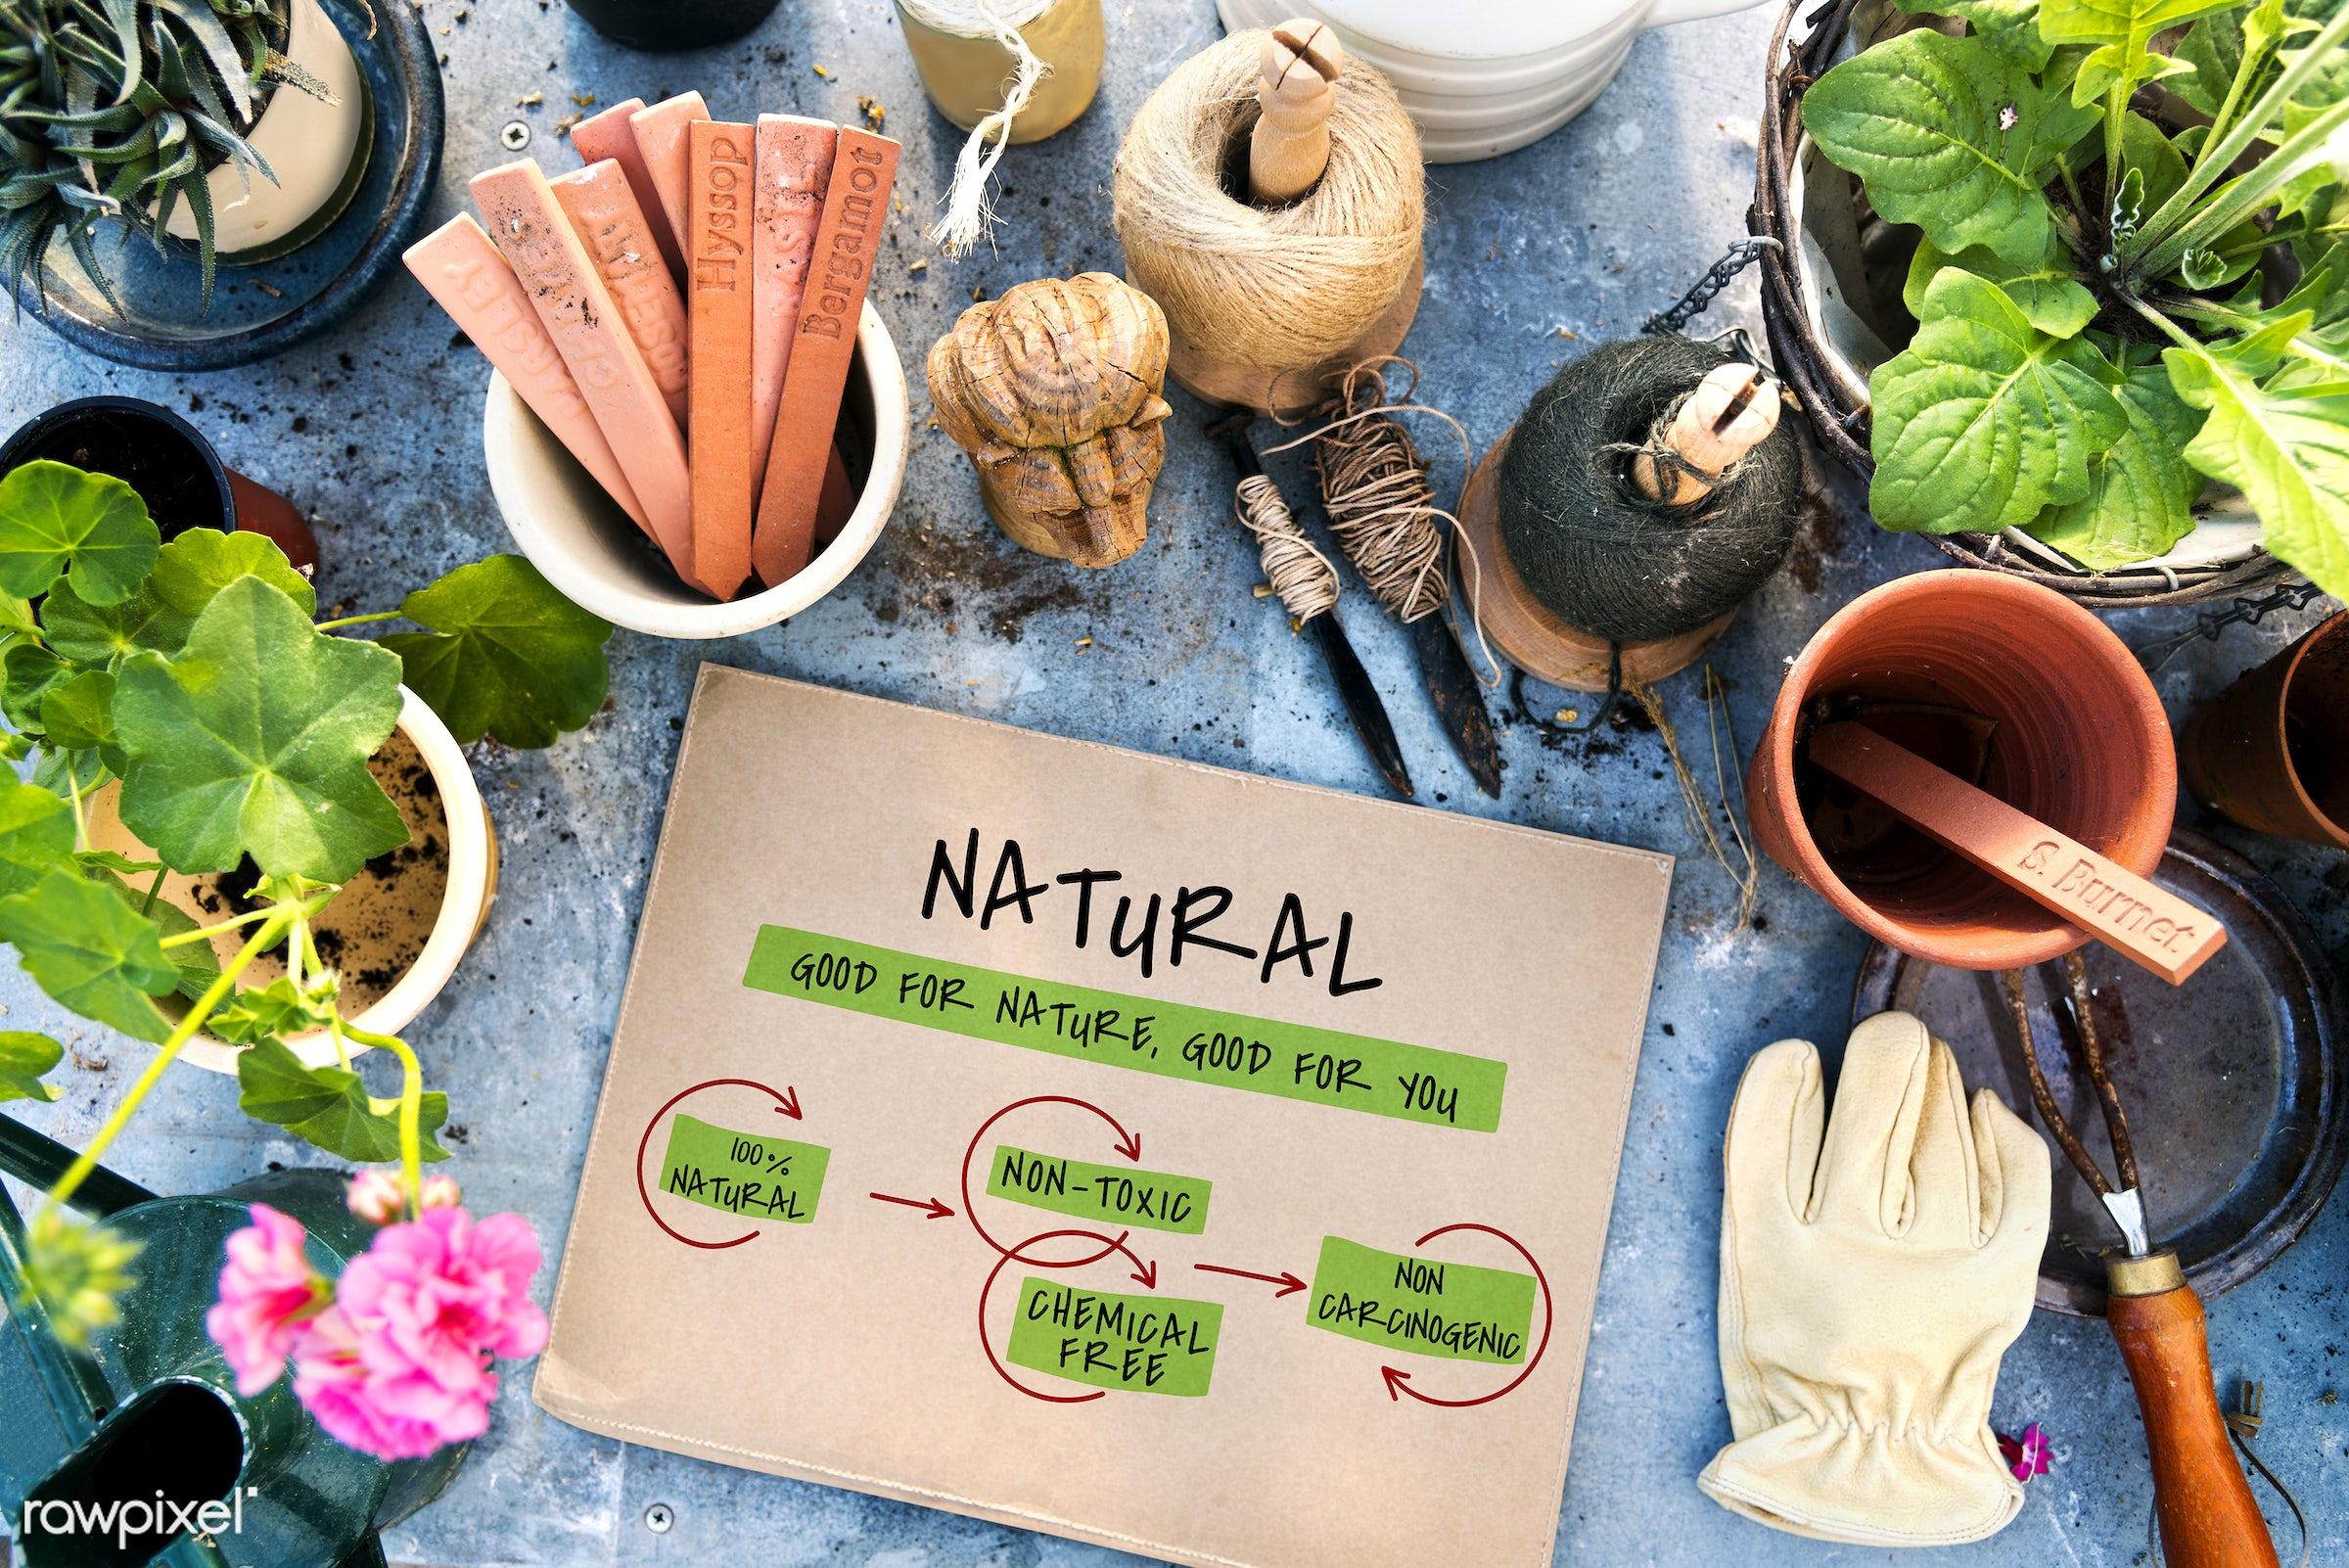 bio, chemical free, eco, ecology, farm, flowerpot, flowers, food, fresh, garden, gardening, glove, graphic, health,...